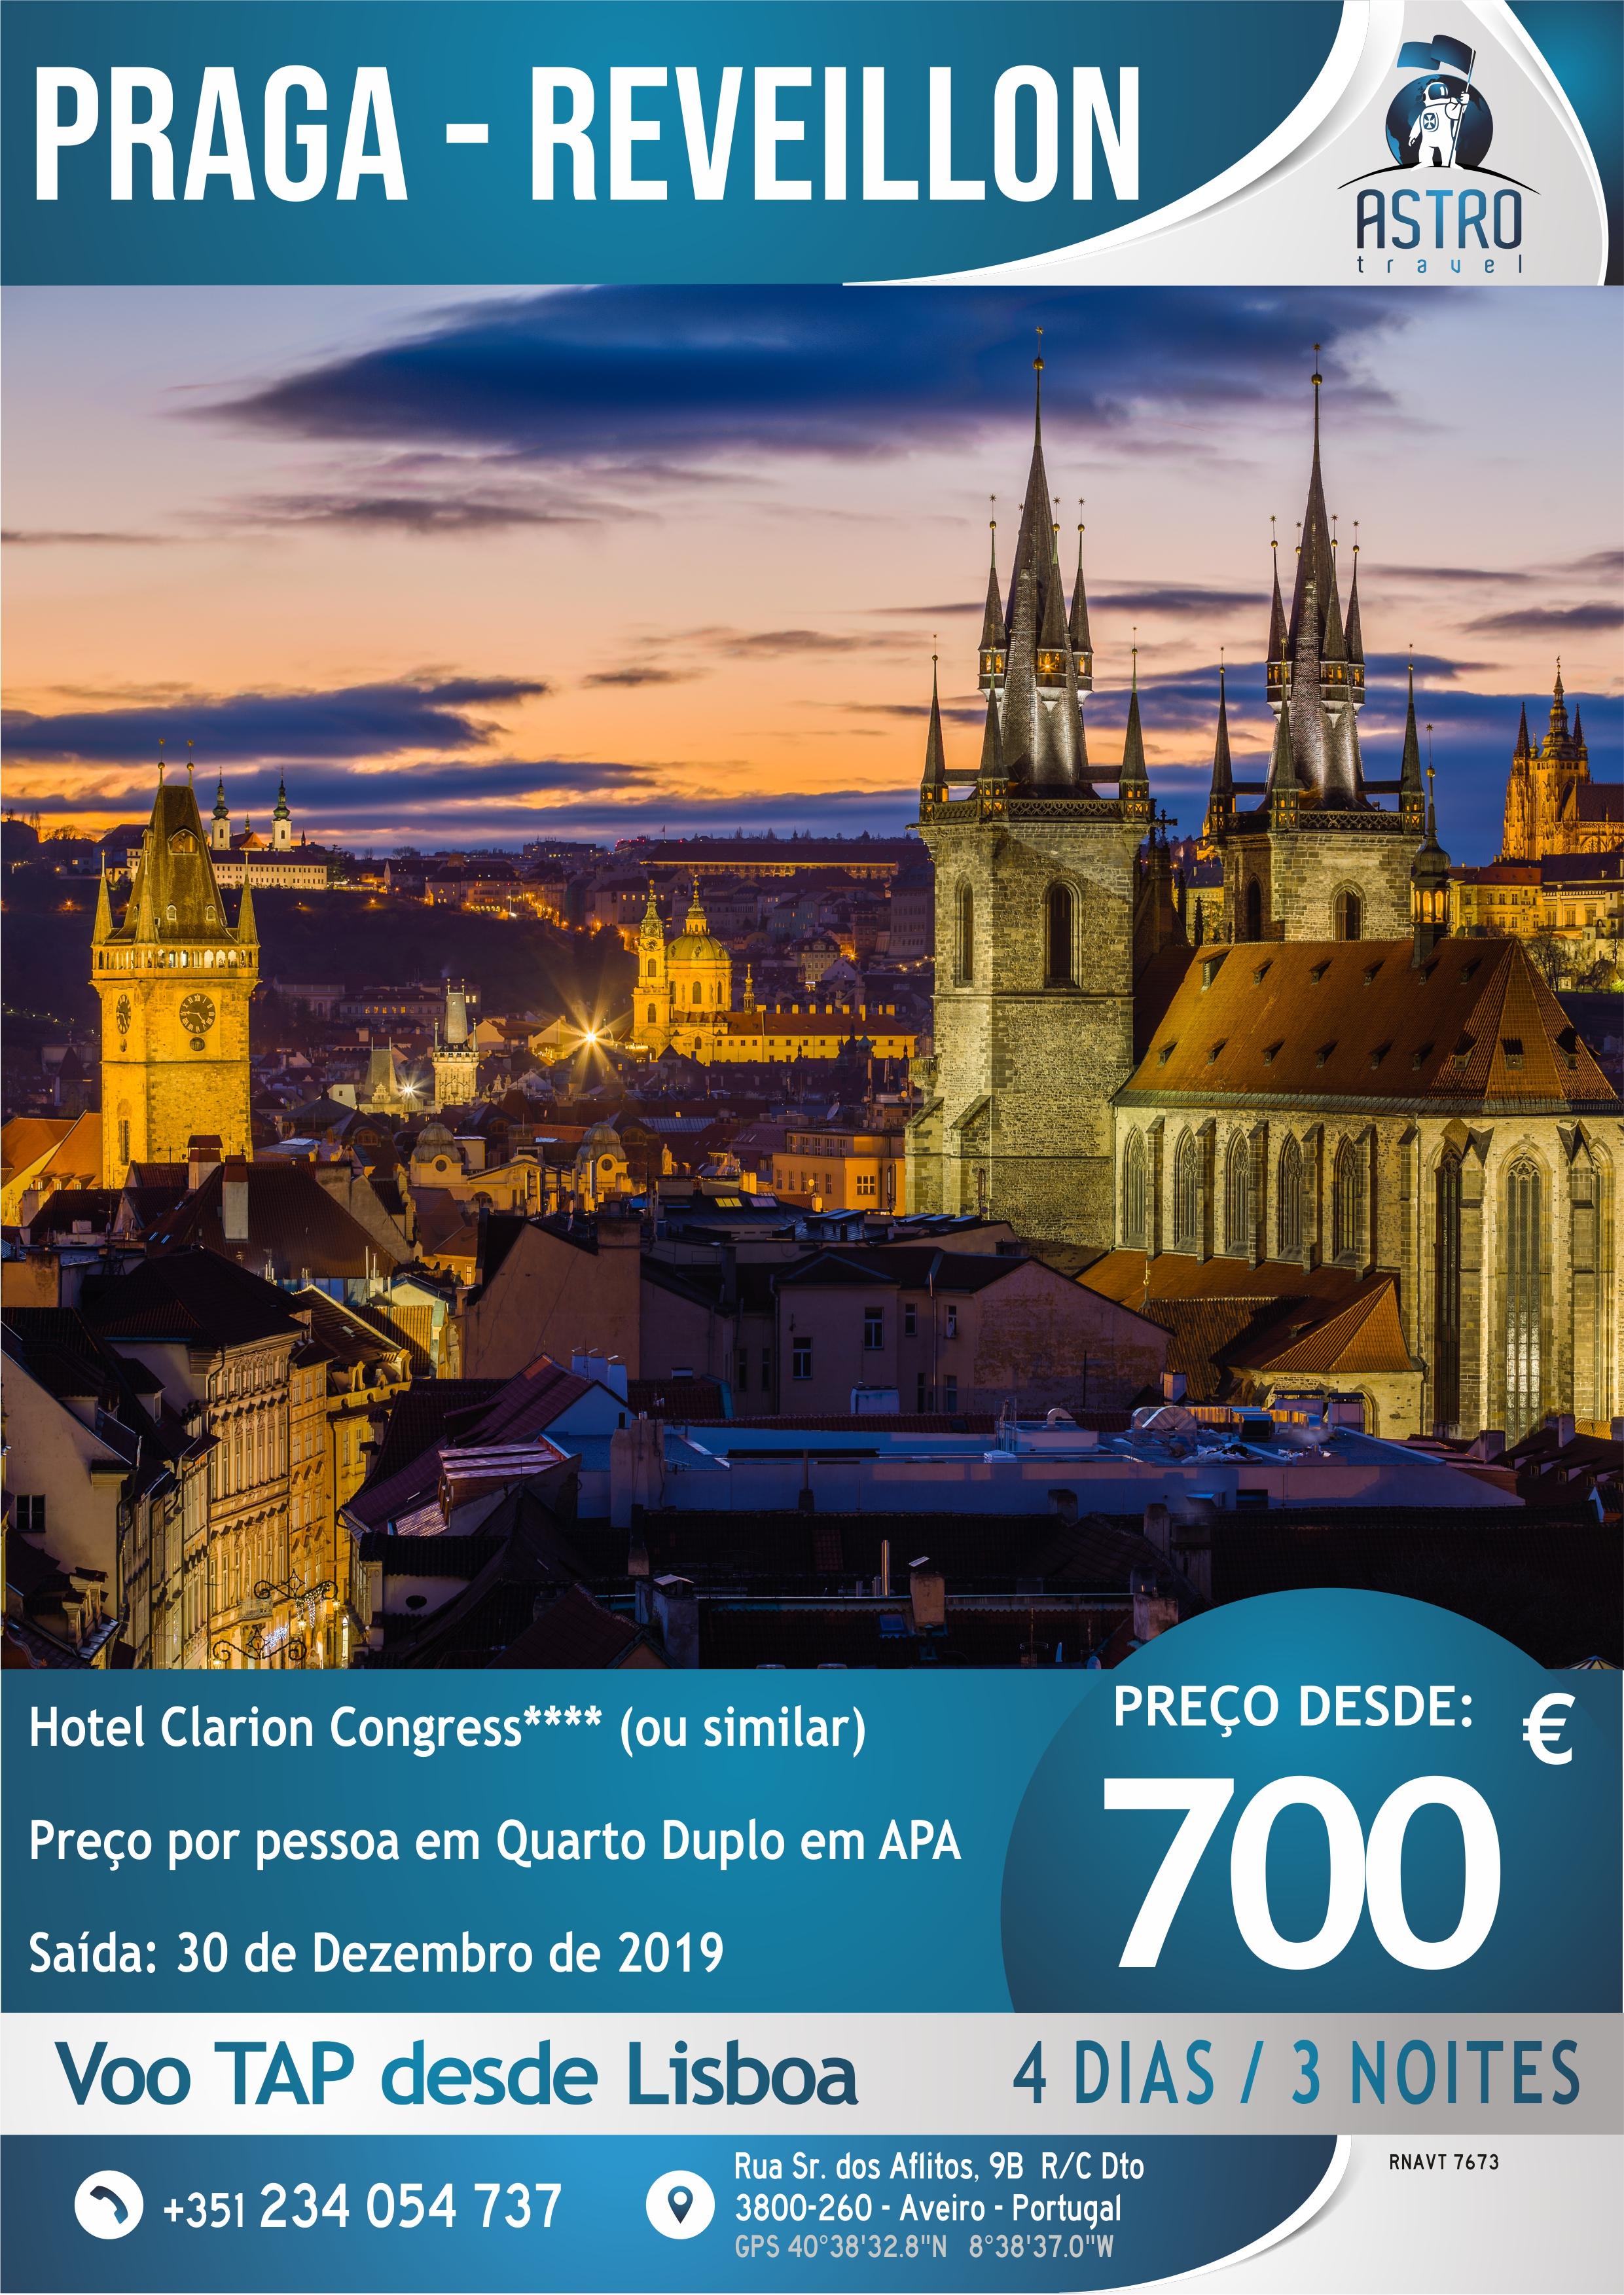 Praga Reveillon 2019 0